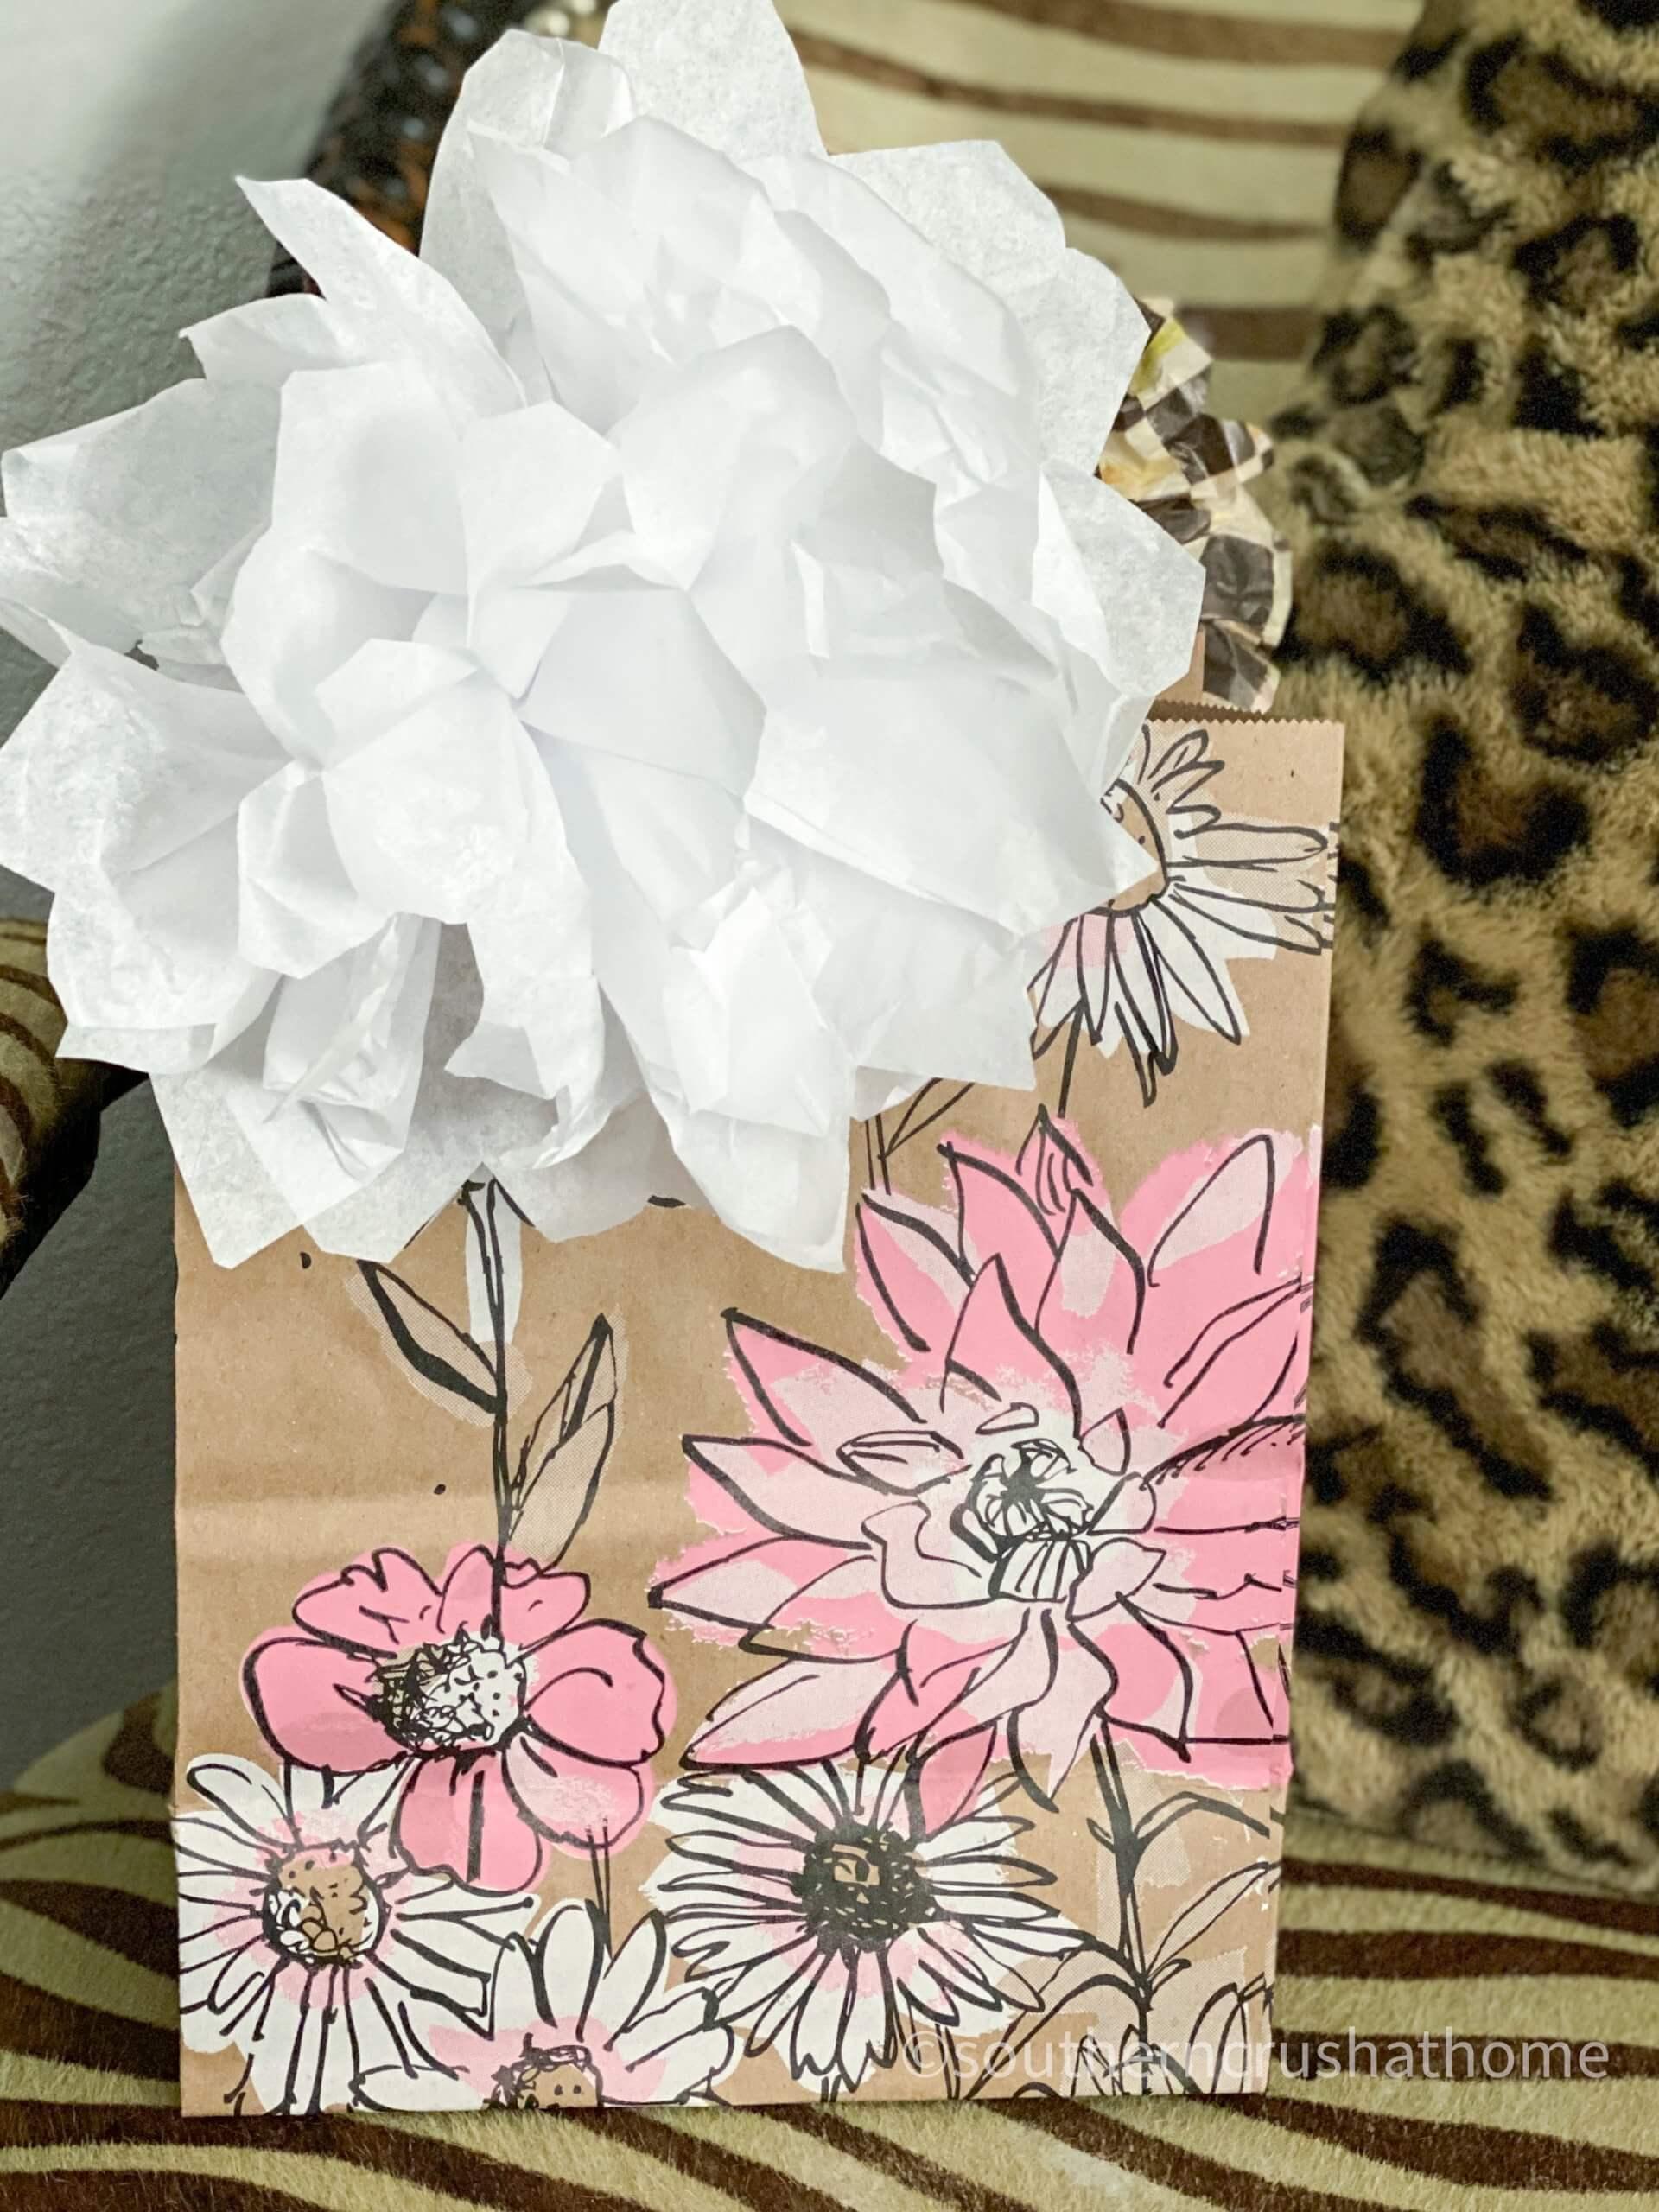 easy-gift-bow-using-tissue-paper white